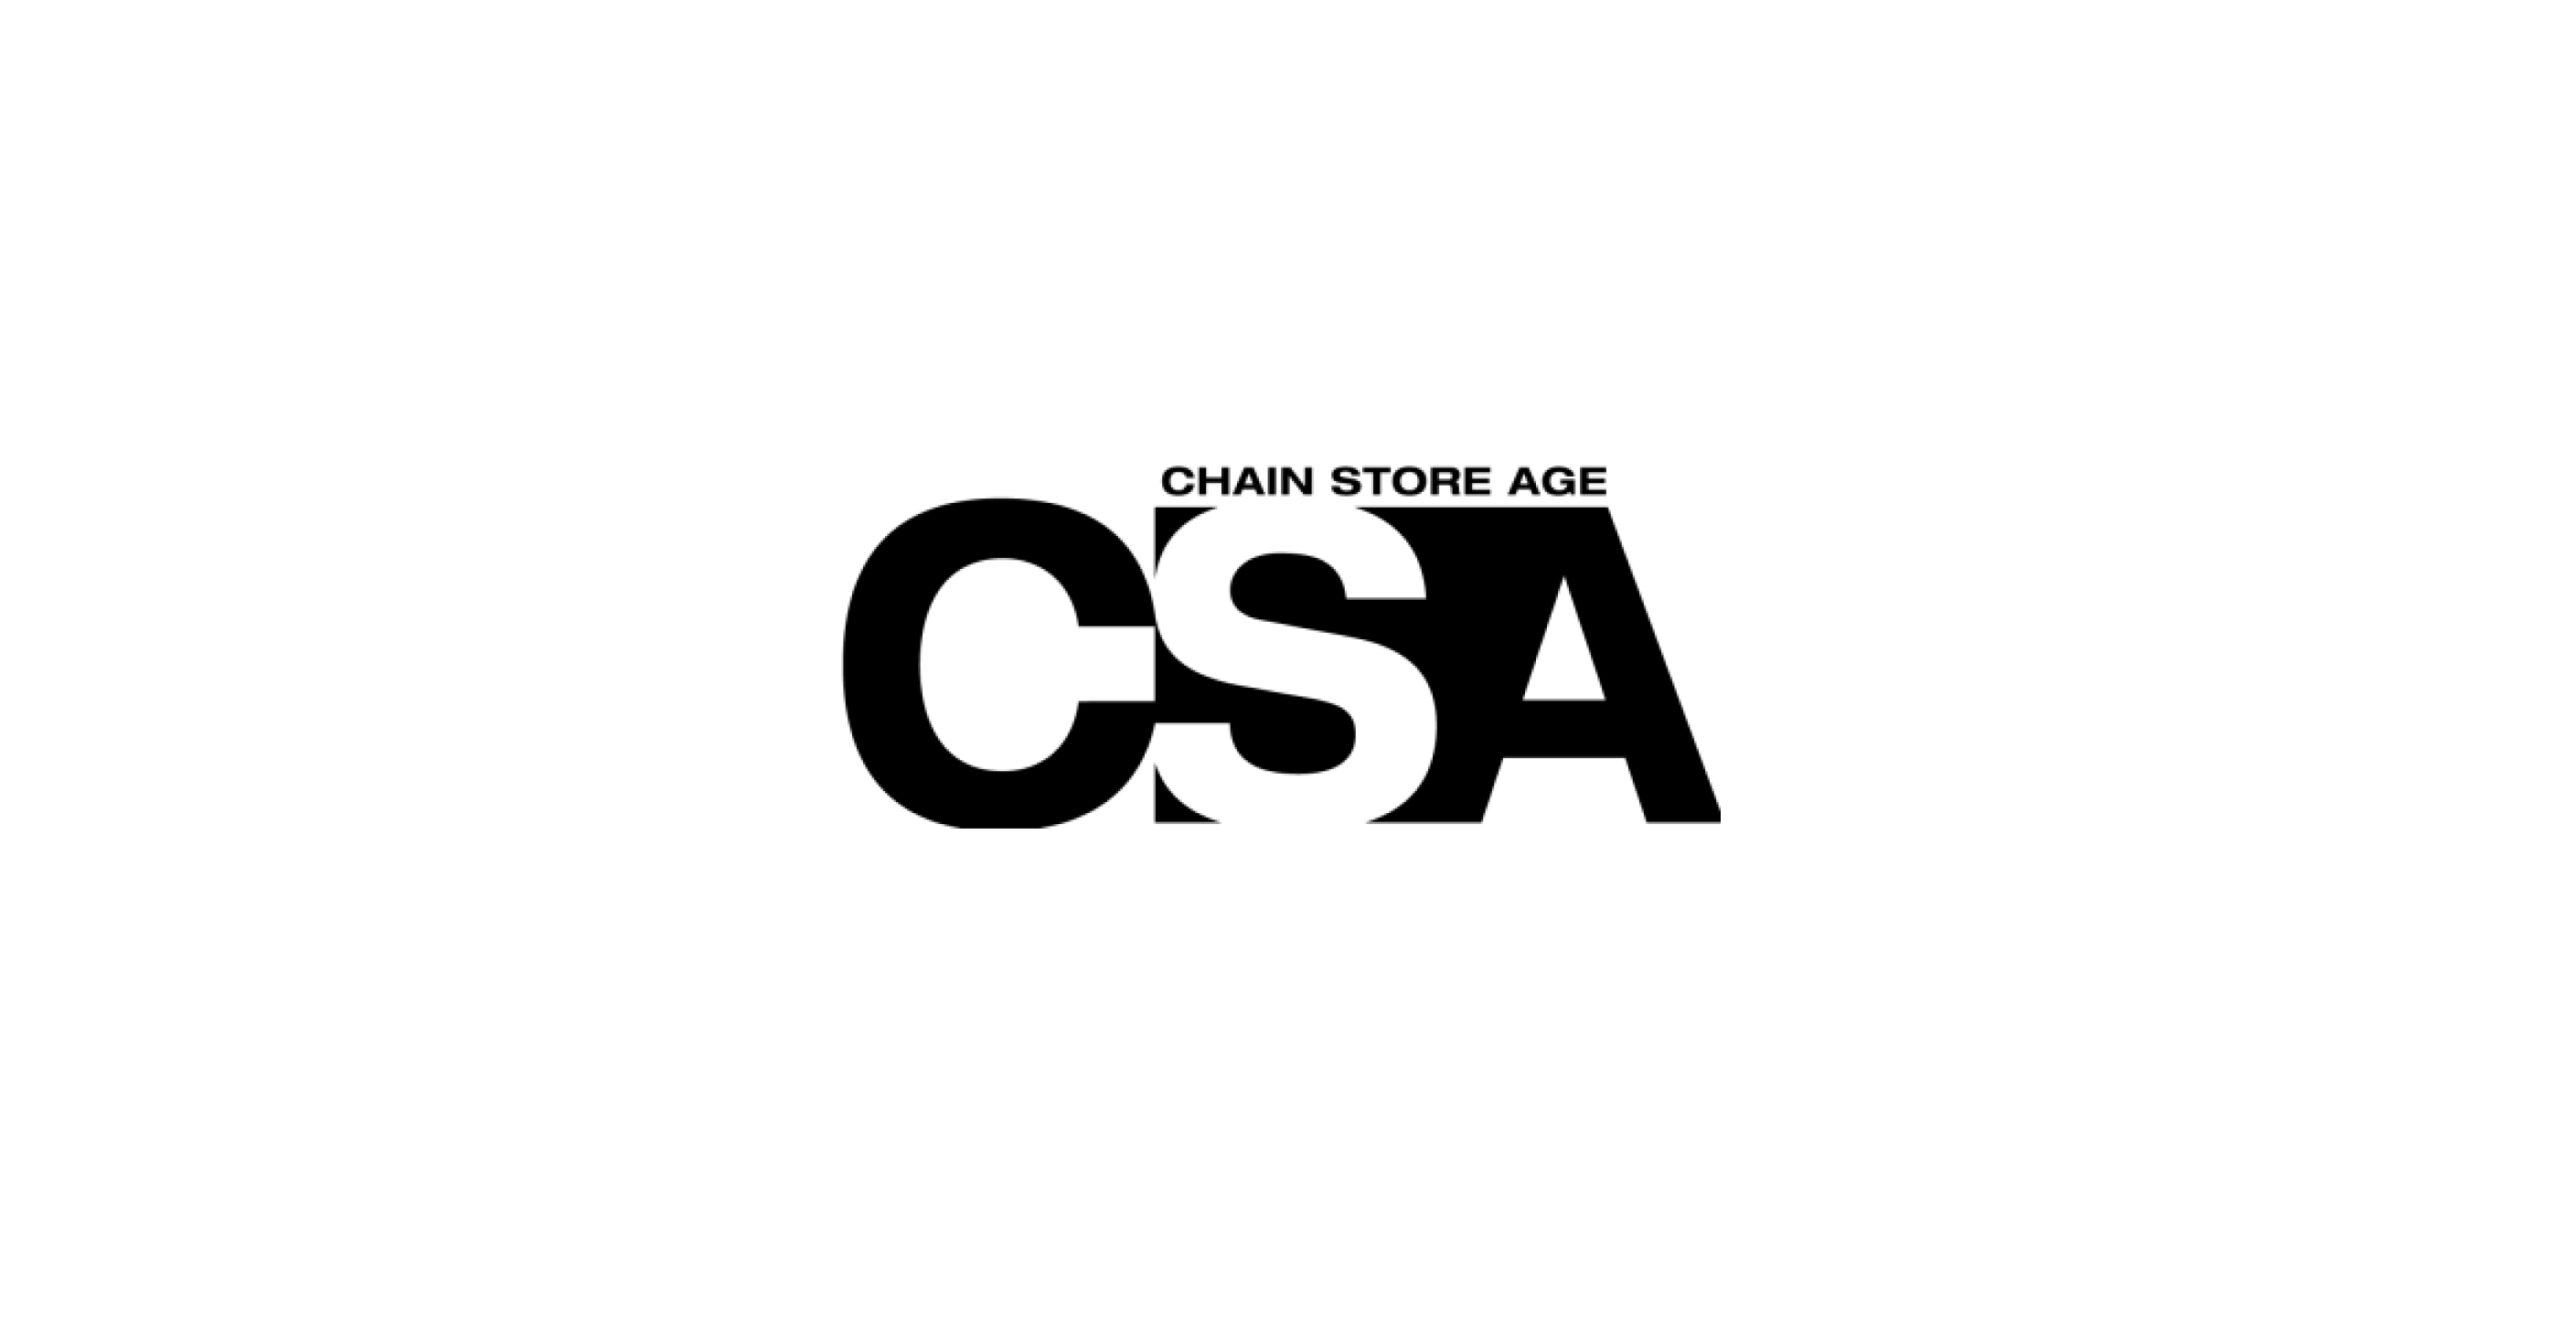 CSA Exclusive: Combat rising returns with flexibility, analytics